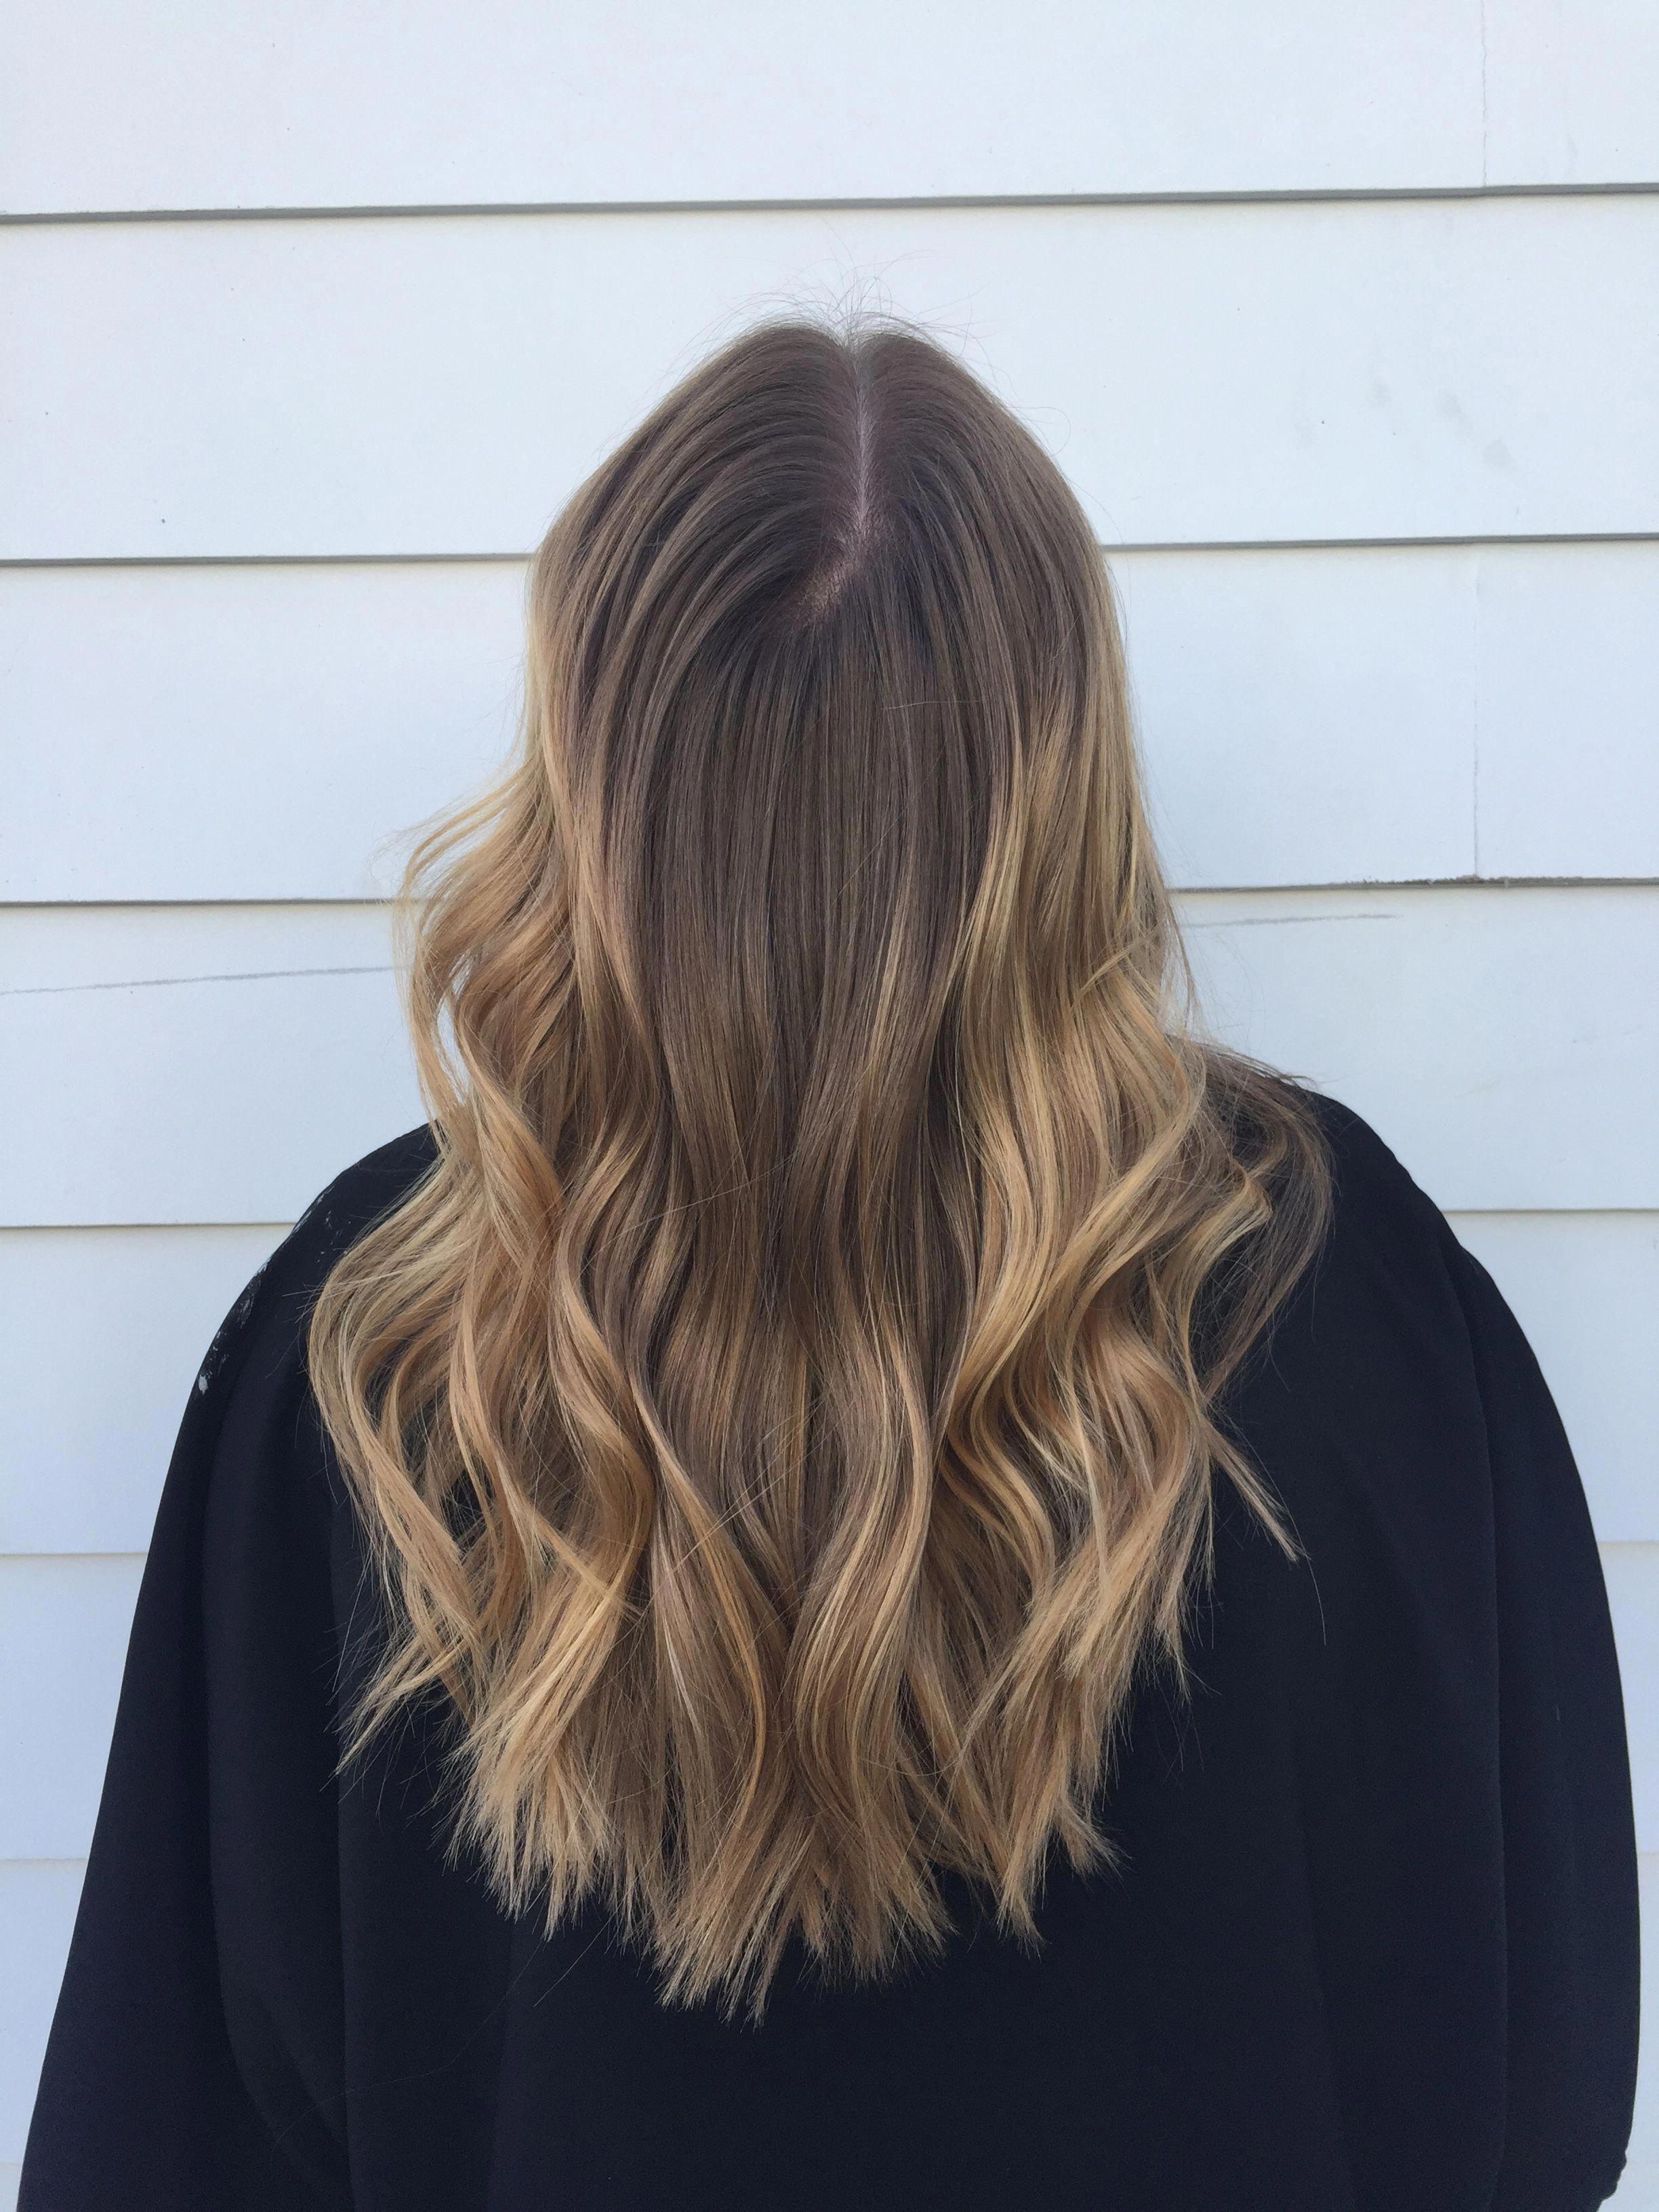 Simple caramel balayage short hair. #caramelbalayageshorthair #shortombrehair #caramelbalayage